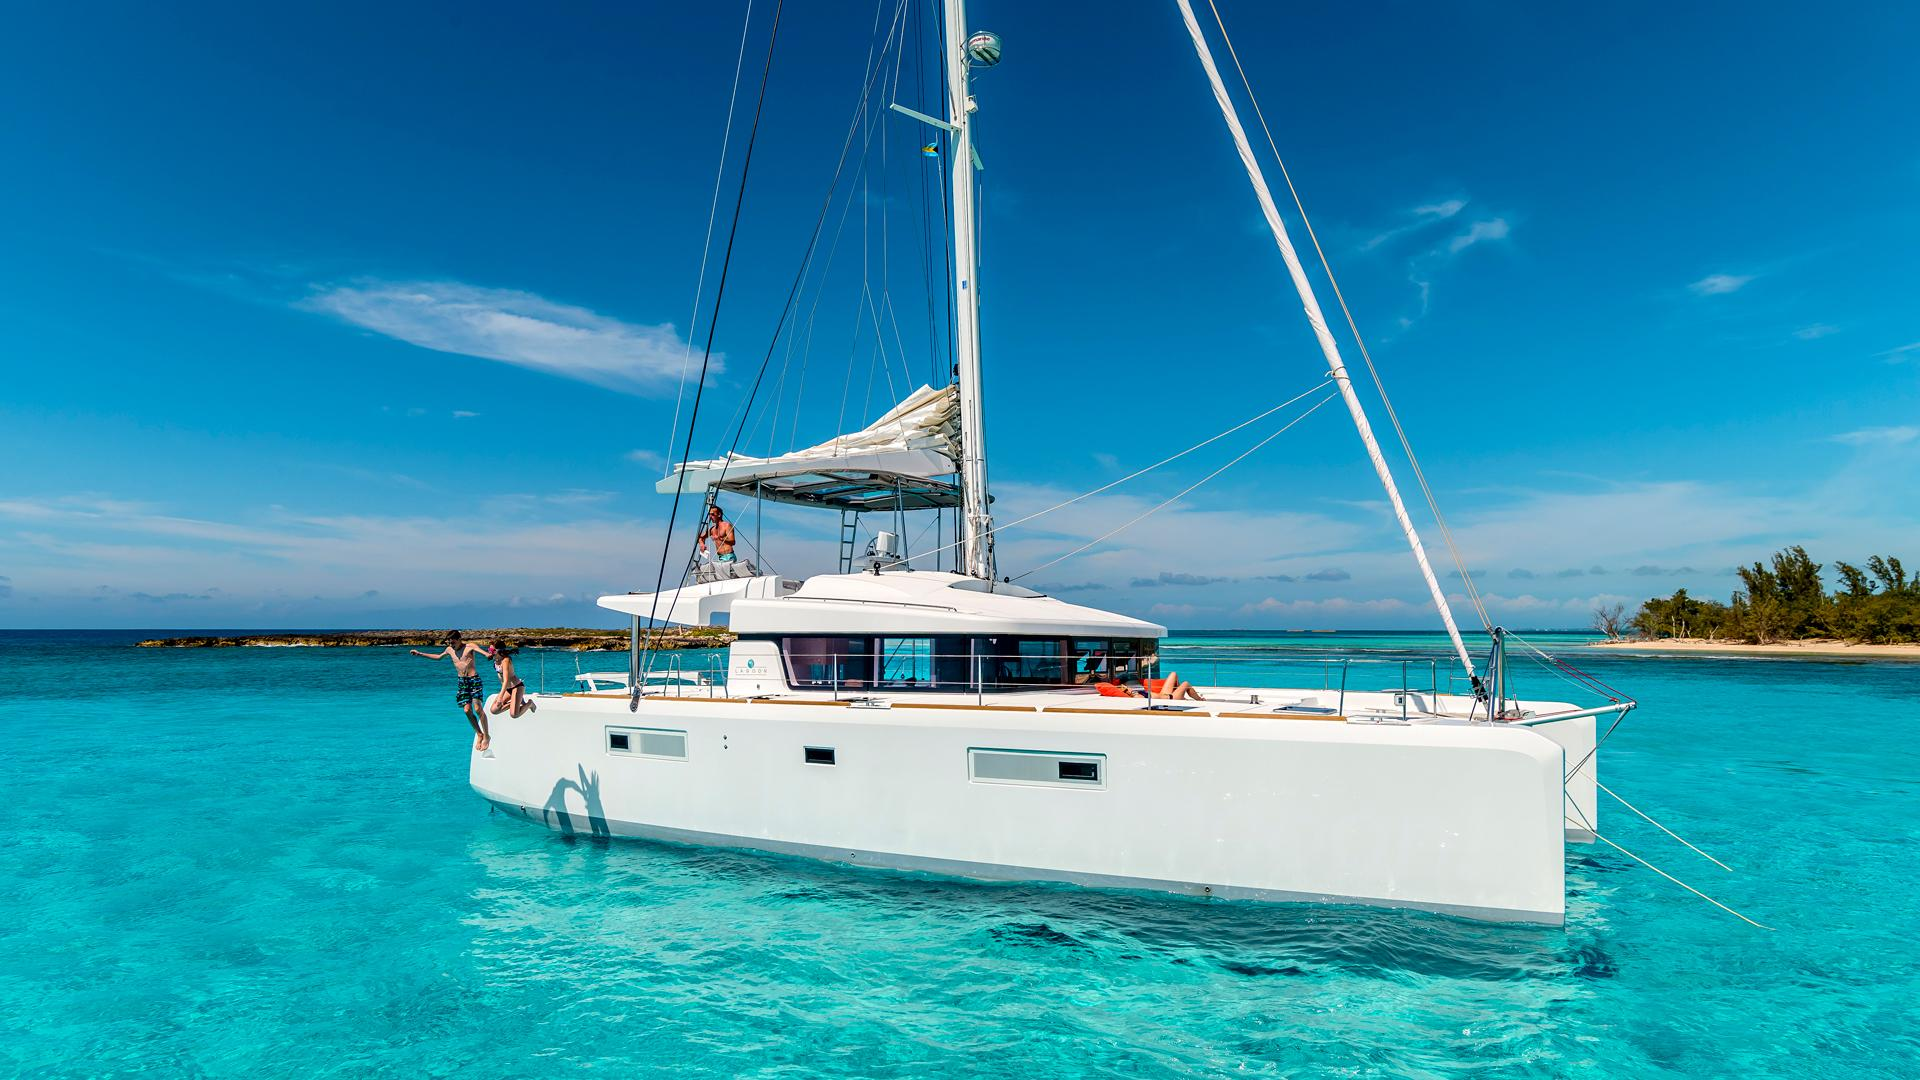 TradeWinds catamaran cruises